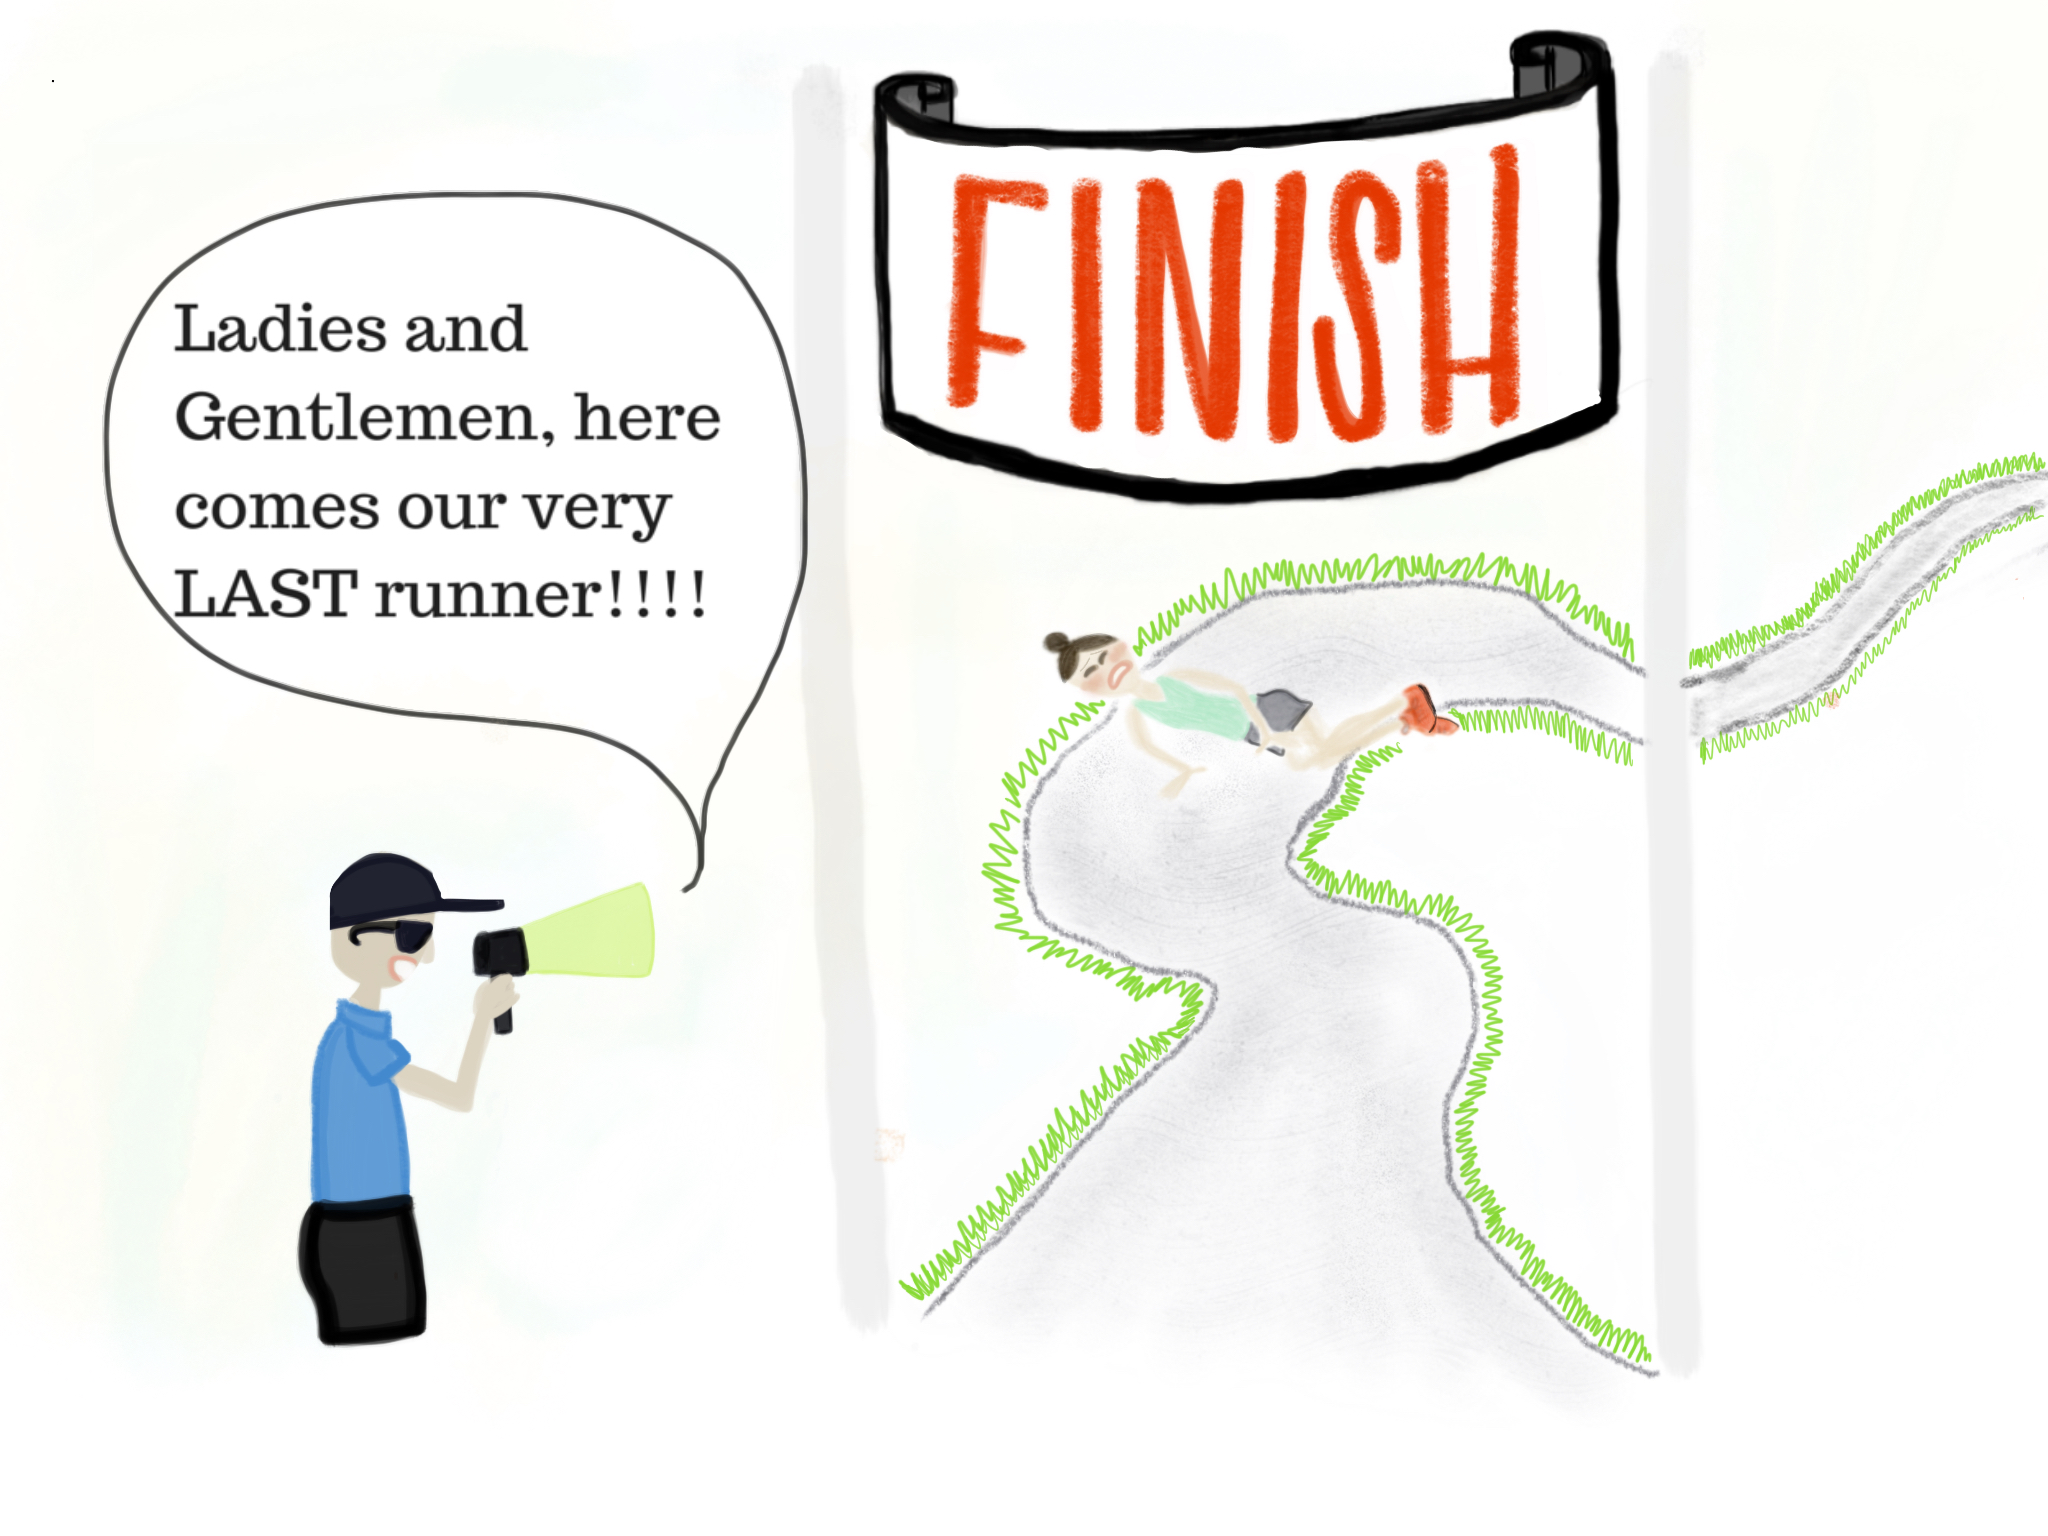 All of It - Running a Marathon: Fears